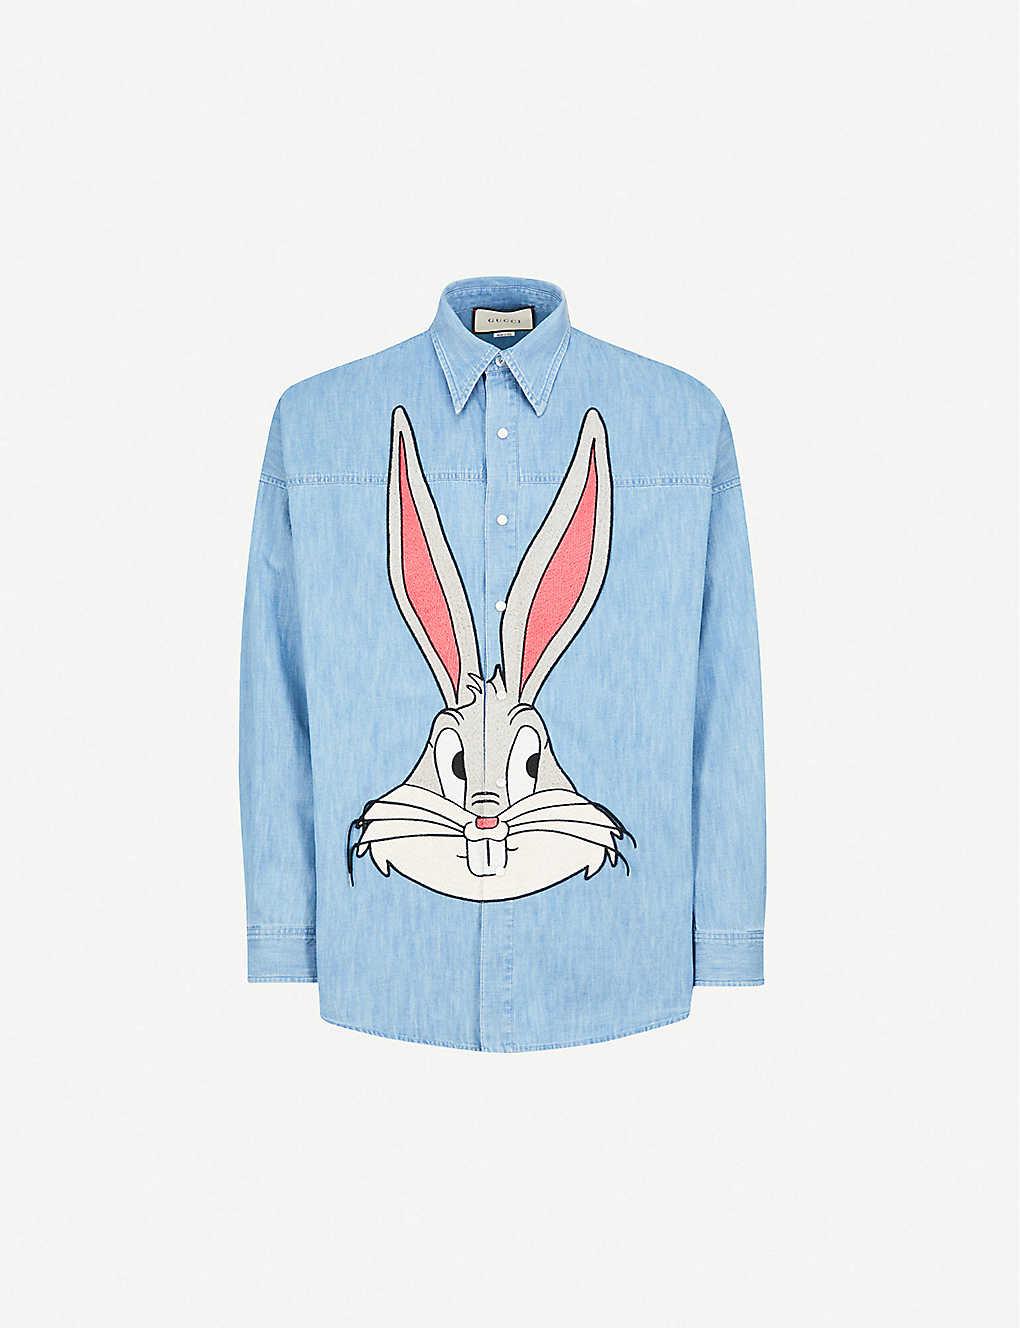 47cf76436369 GUCCI - Bugs Bunny regular-fit denim shirt | Selfridges.com